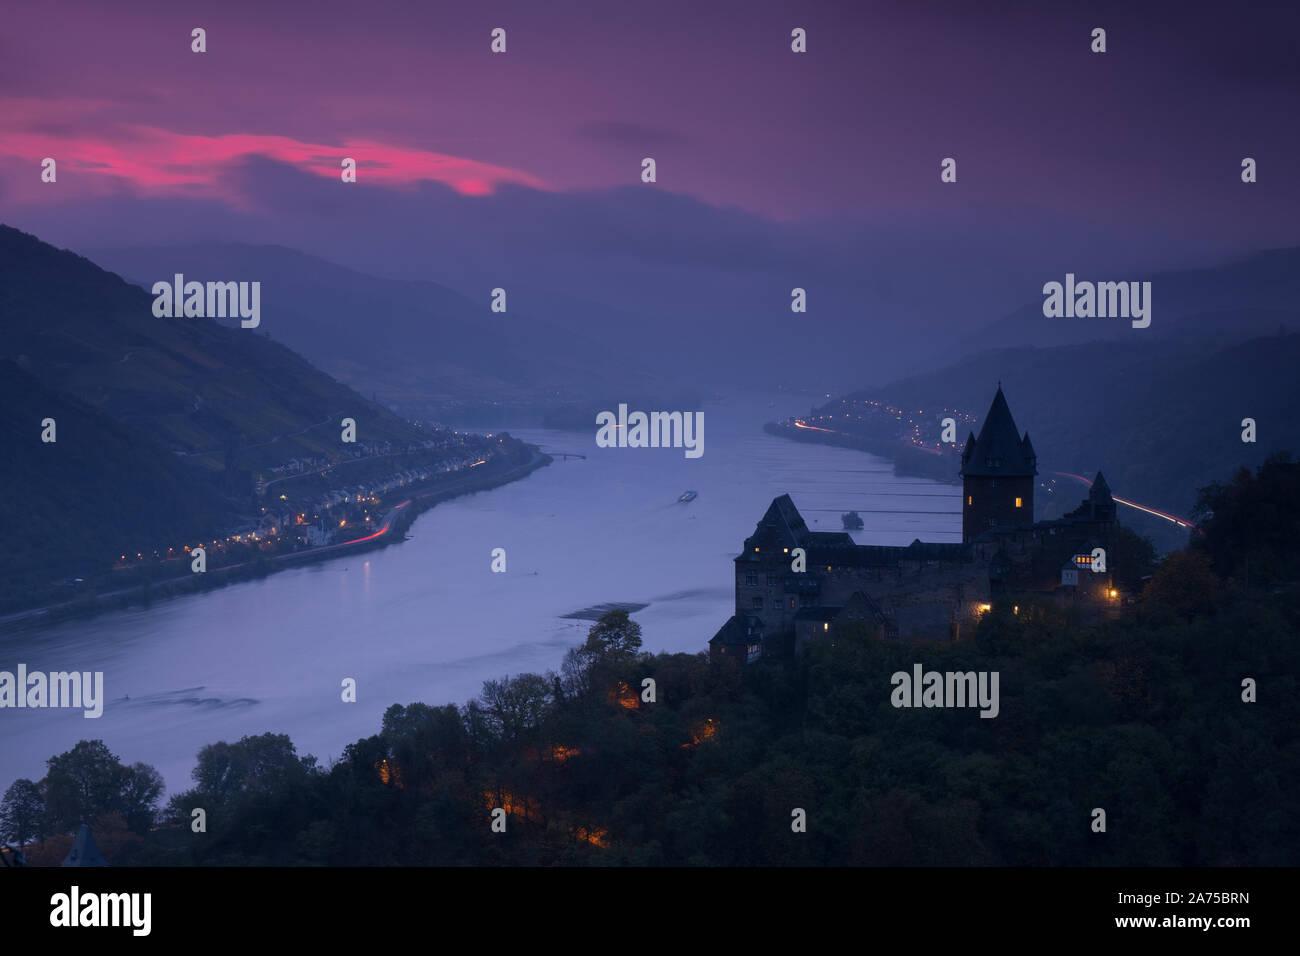 Rhine valley at Bacharach, Germany Stock Photo